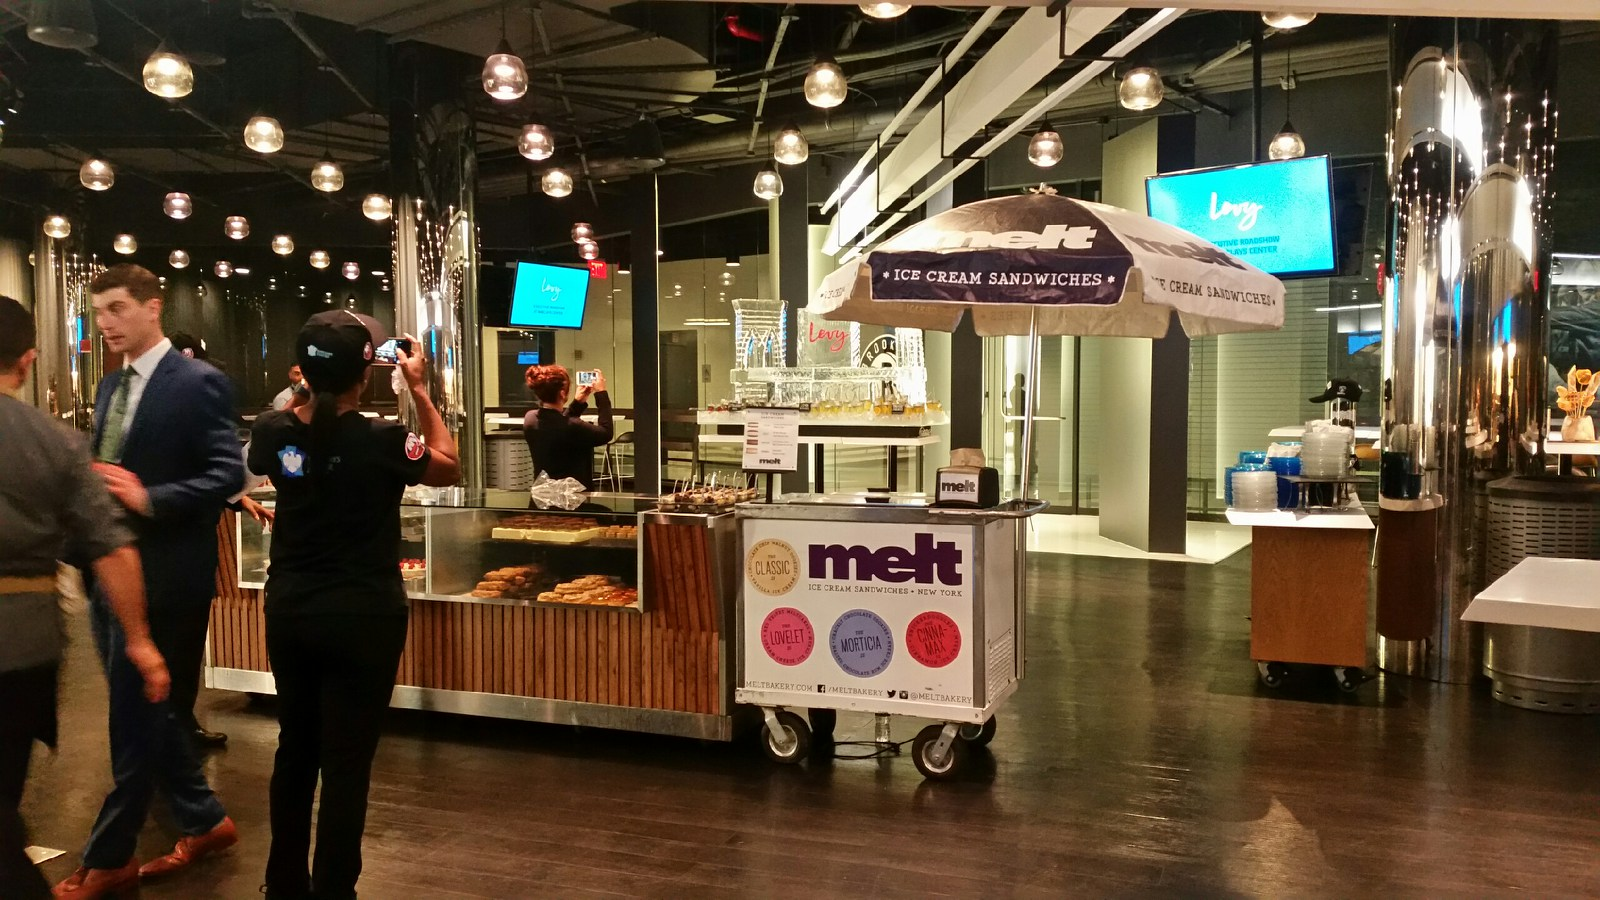 Melt bakery ice cream food truck